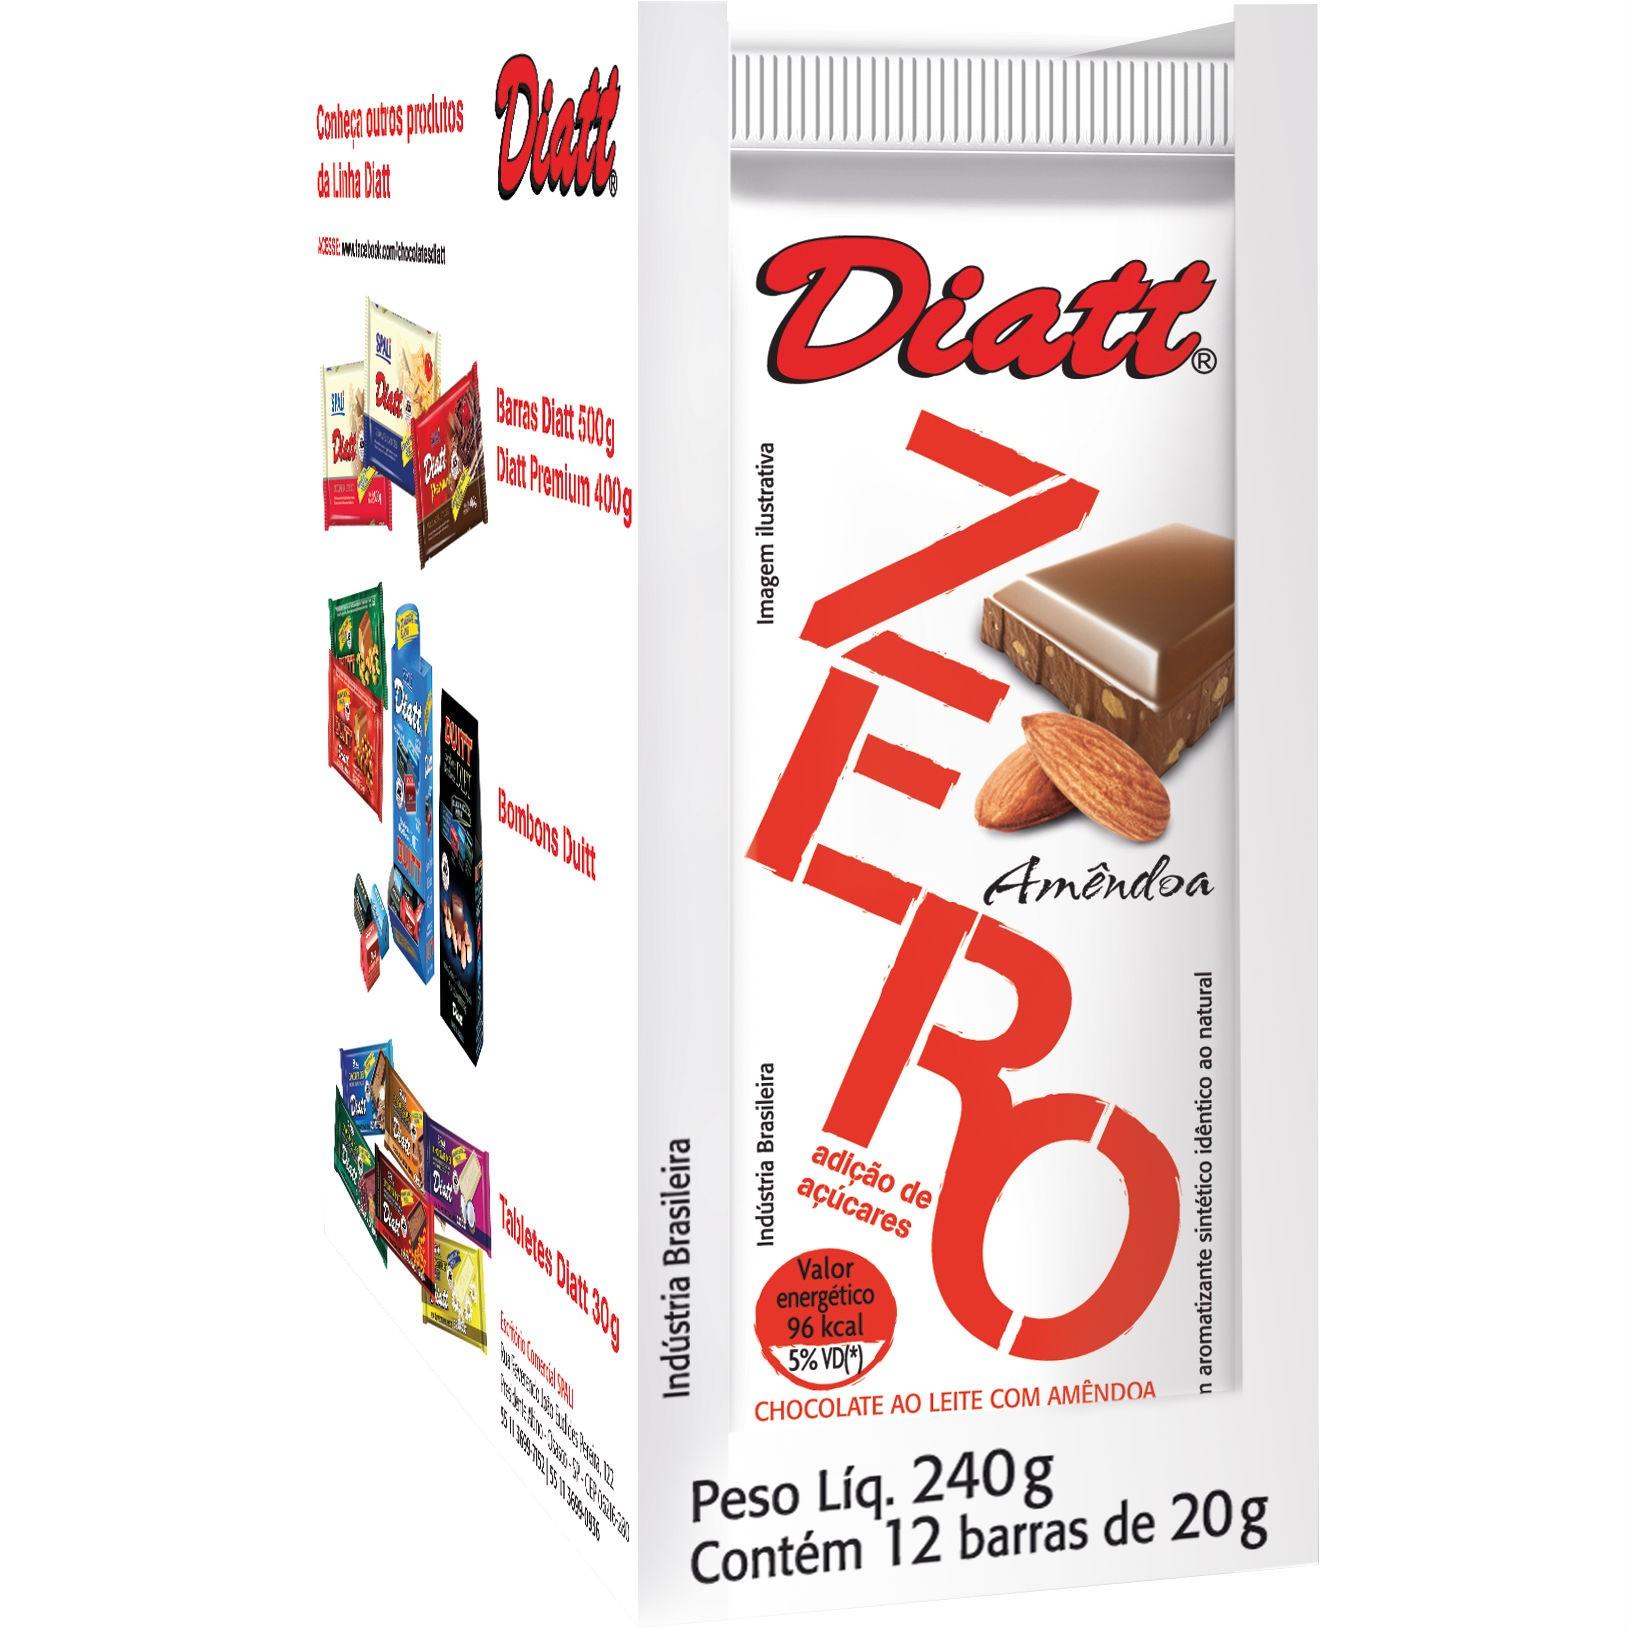 Chocolate Zero Amêndoa 20g x12 display 240g - Diatt